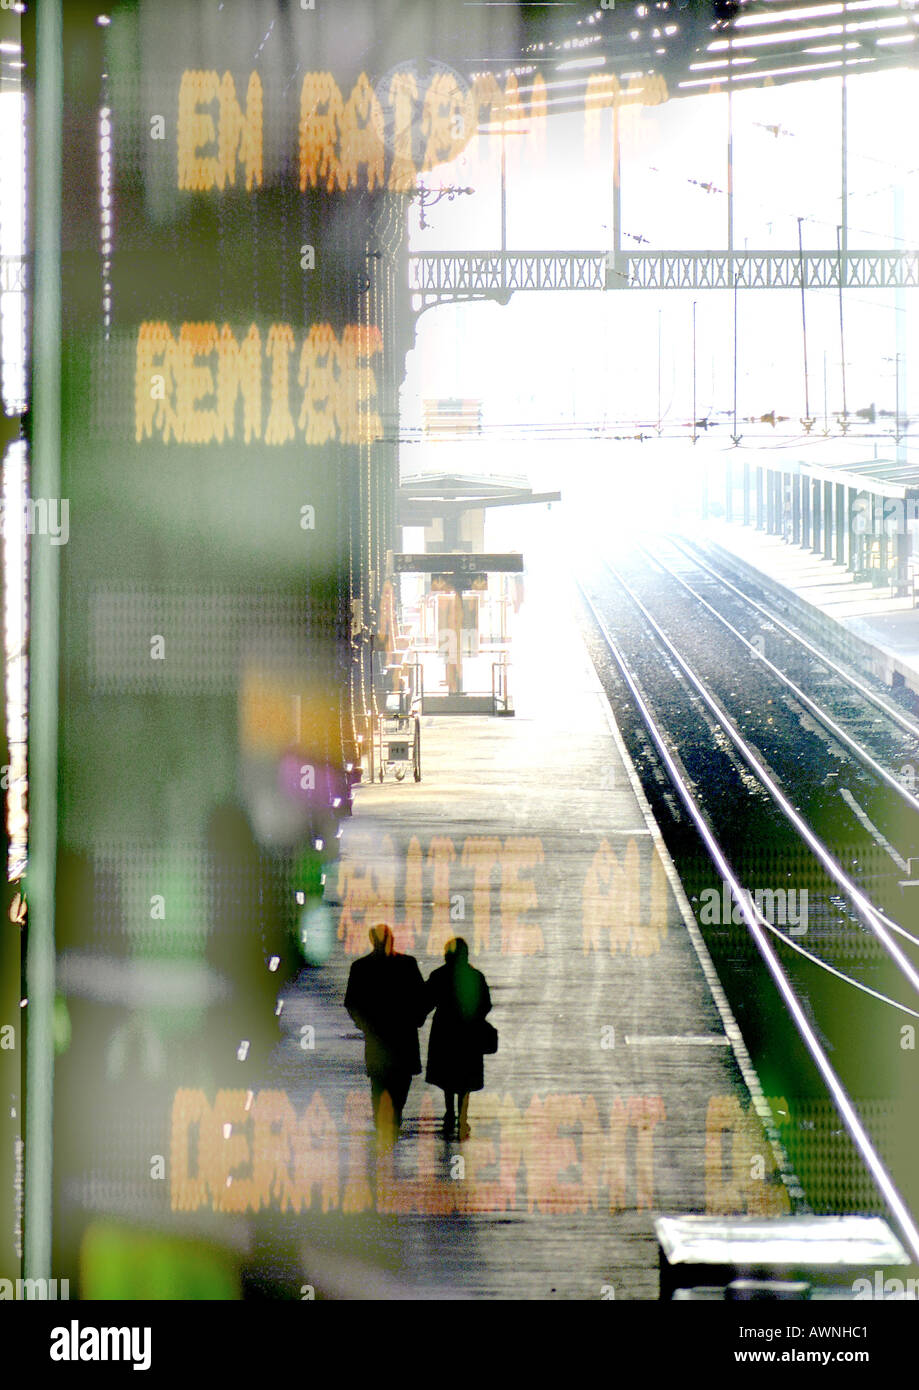 Couple walking on train platform, information sign superimposed - Stock Image